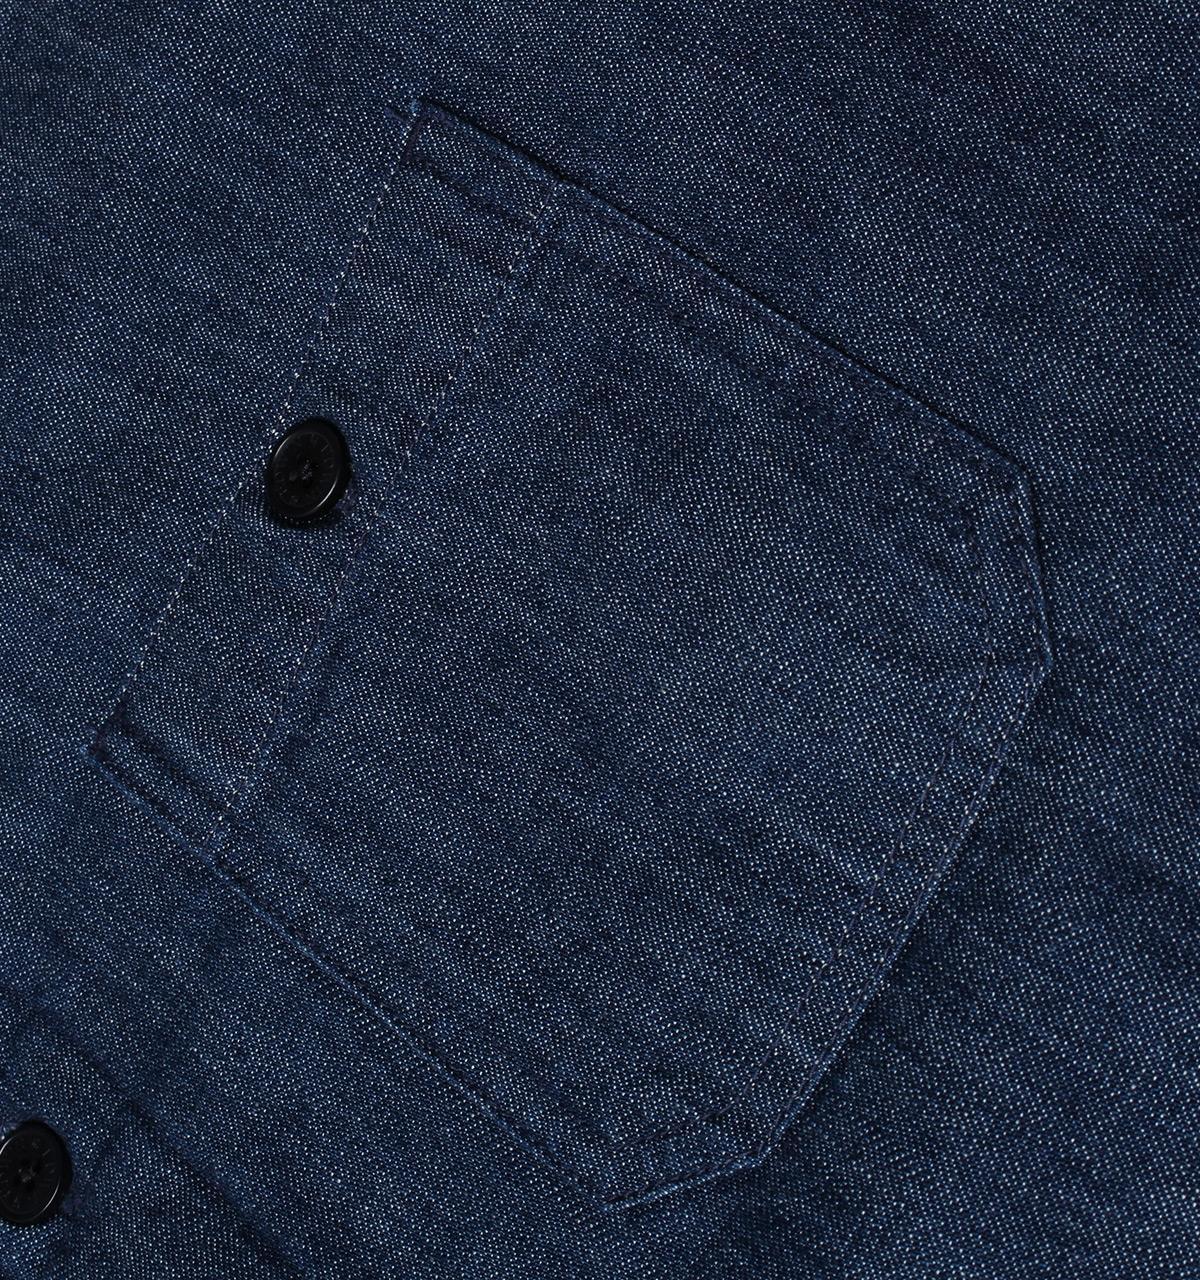 Edwin Blue Denim Labour Four Pocket Padded Overshirt